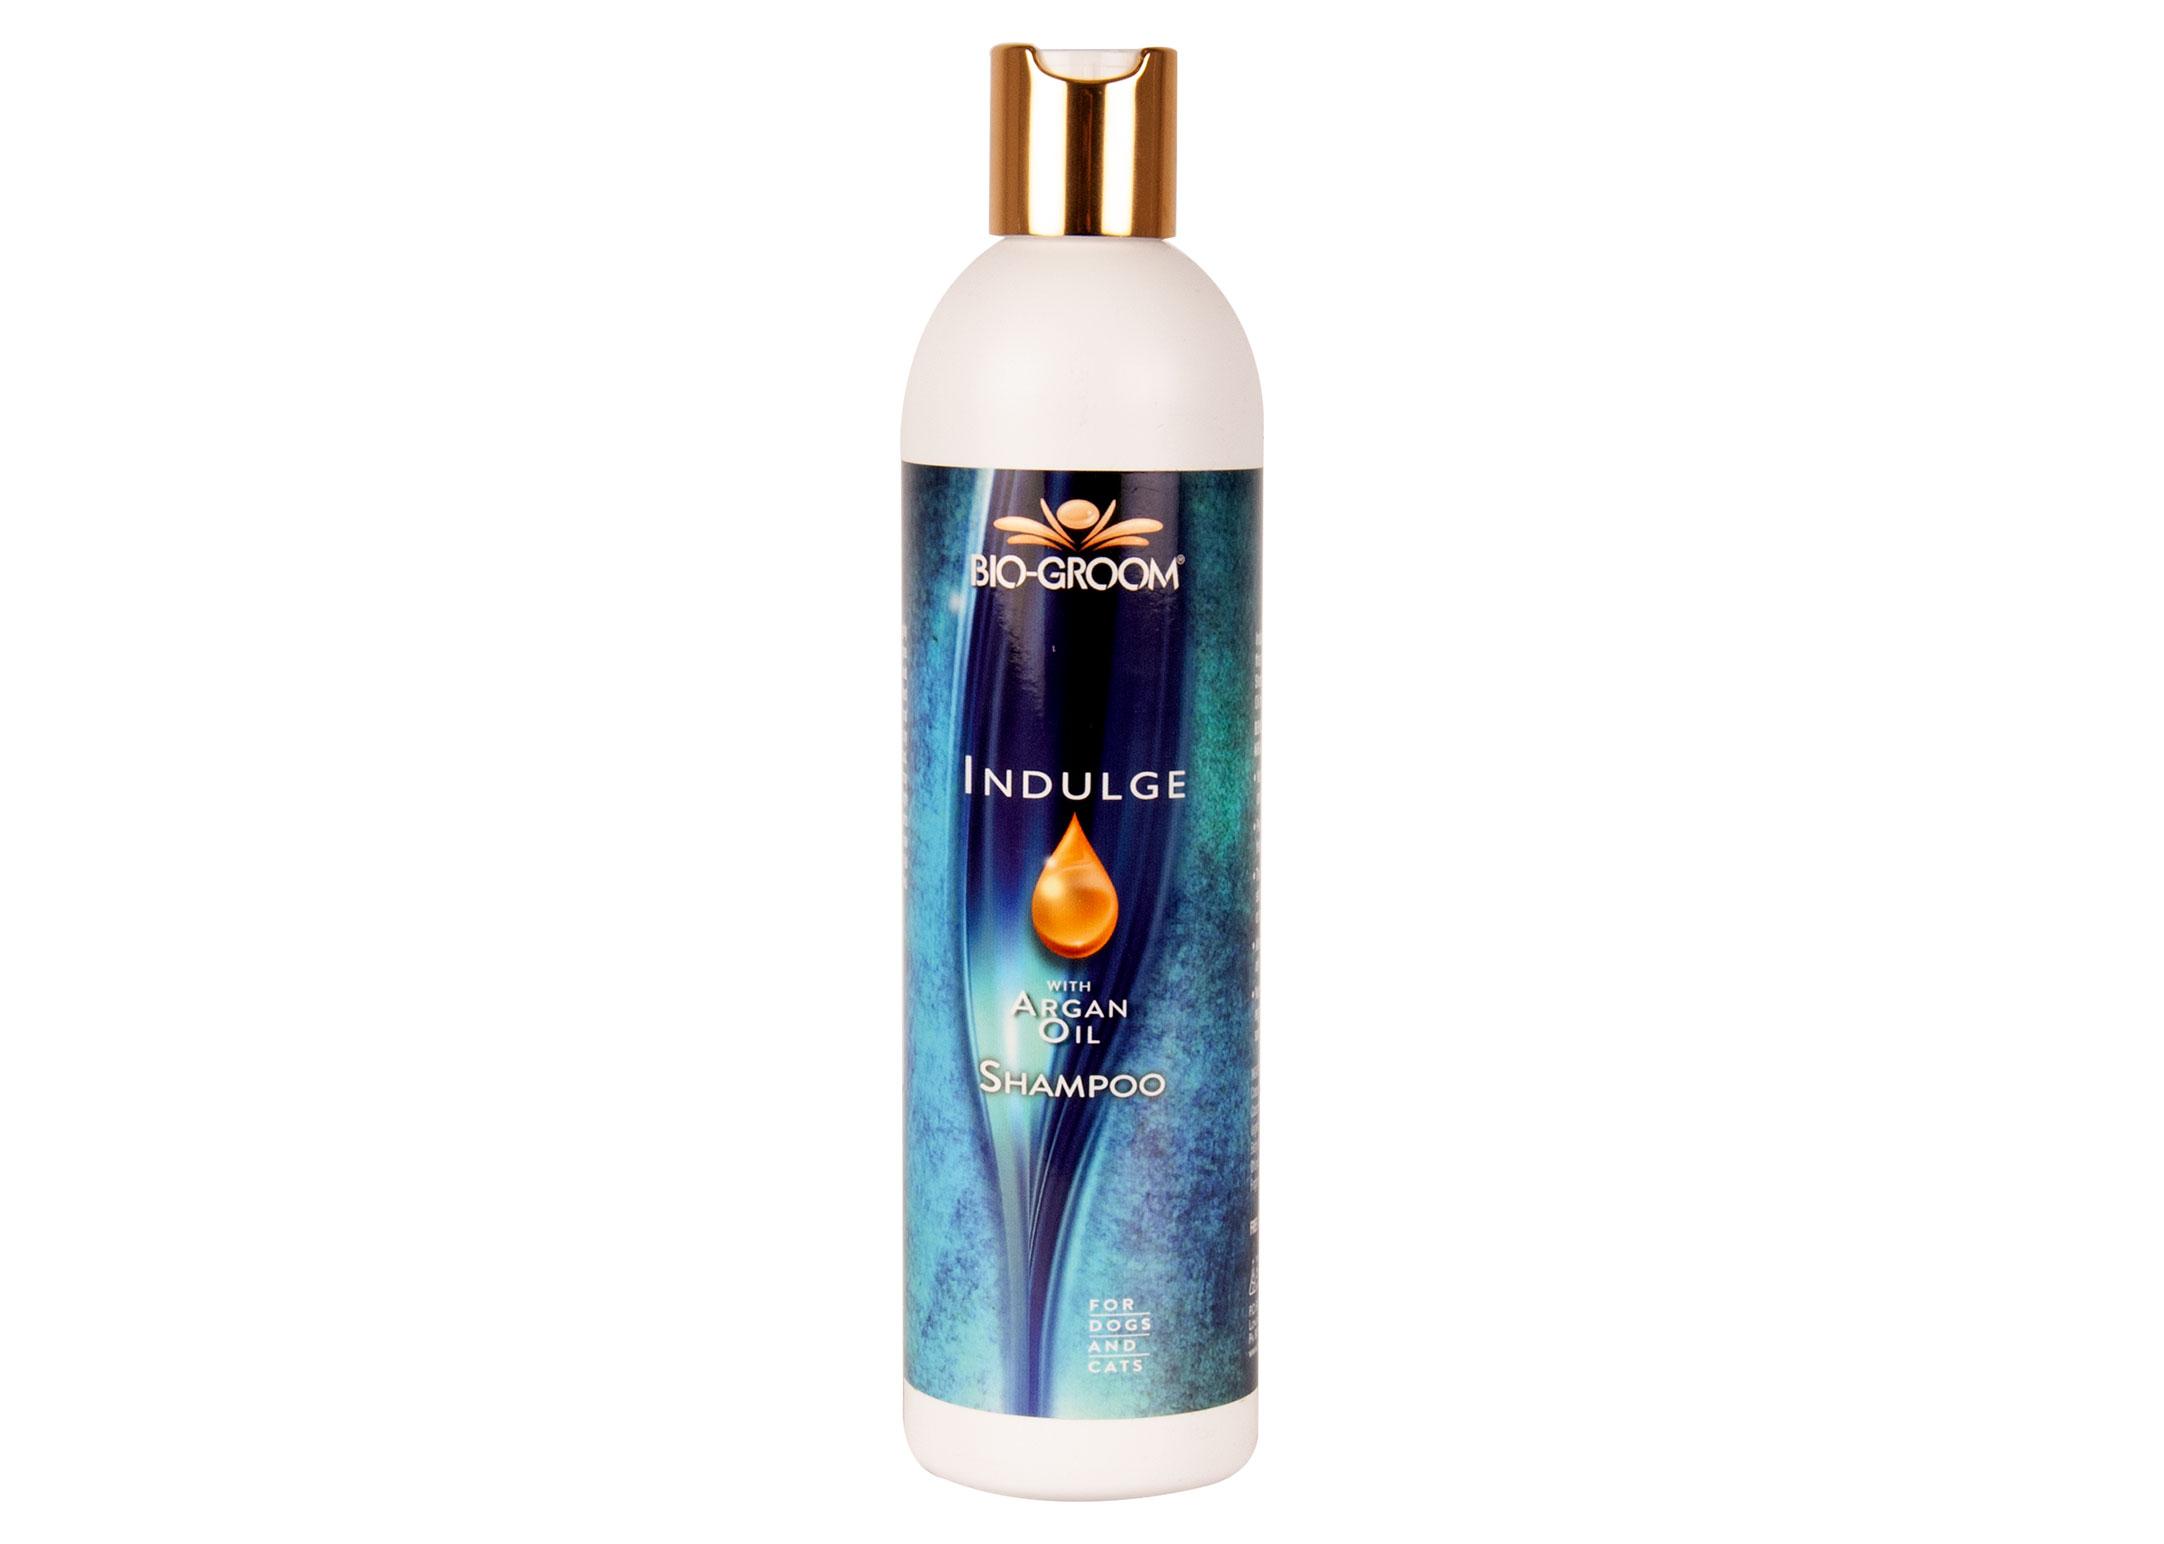 Bio Groom Indulge Argan Huile Shampoo